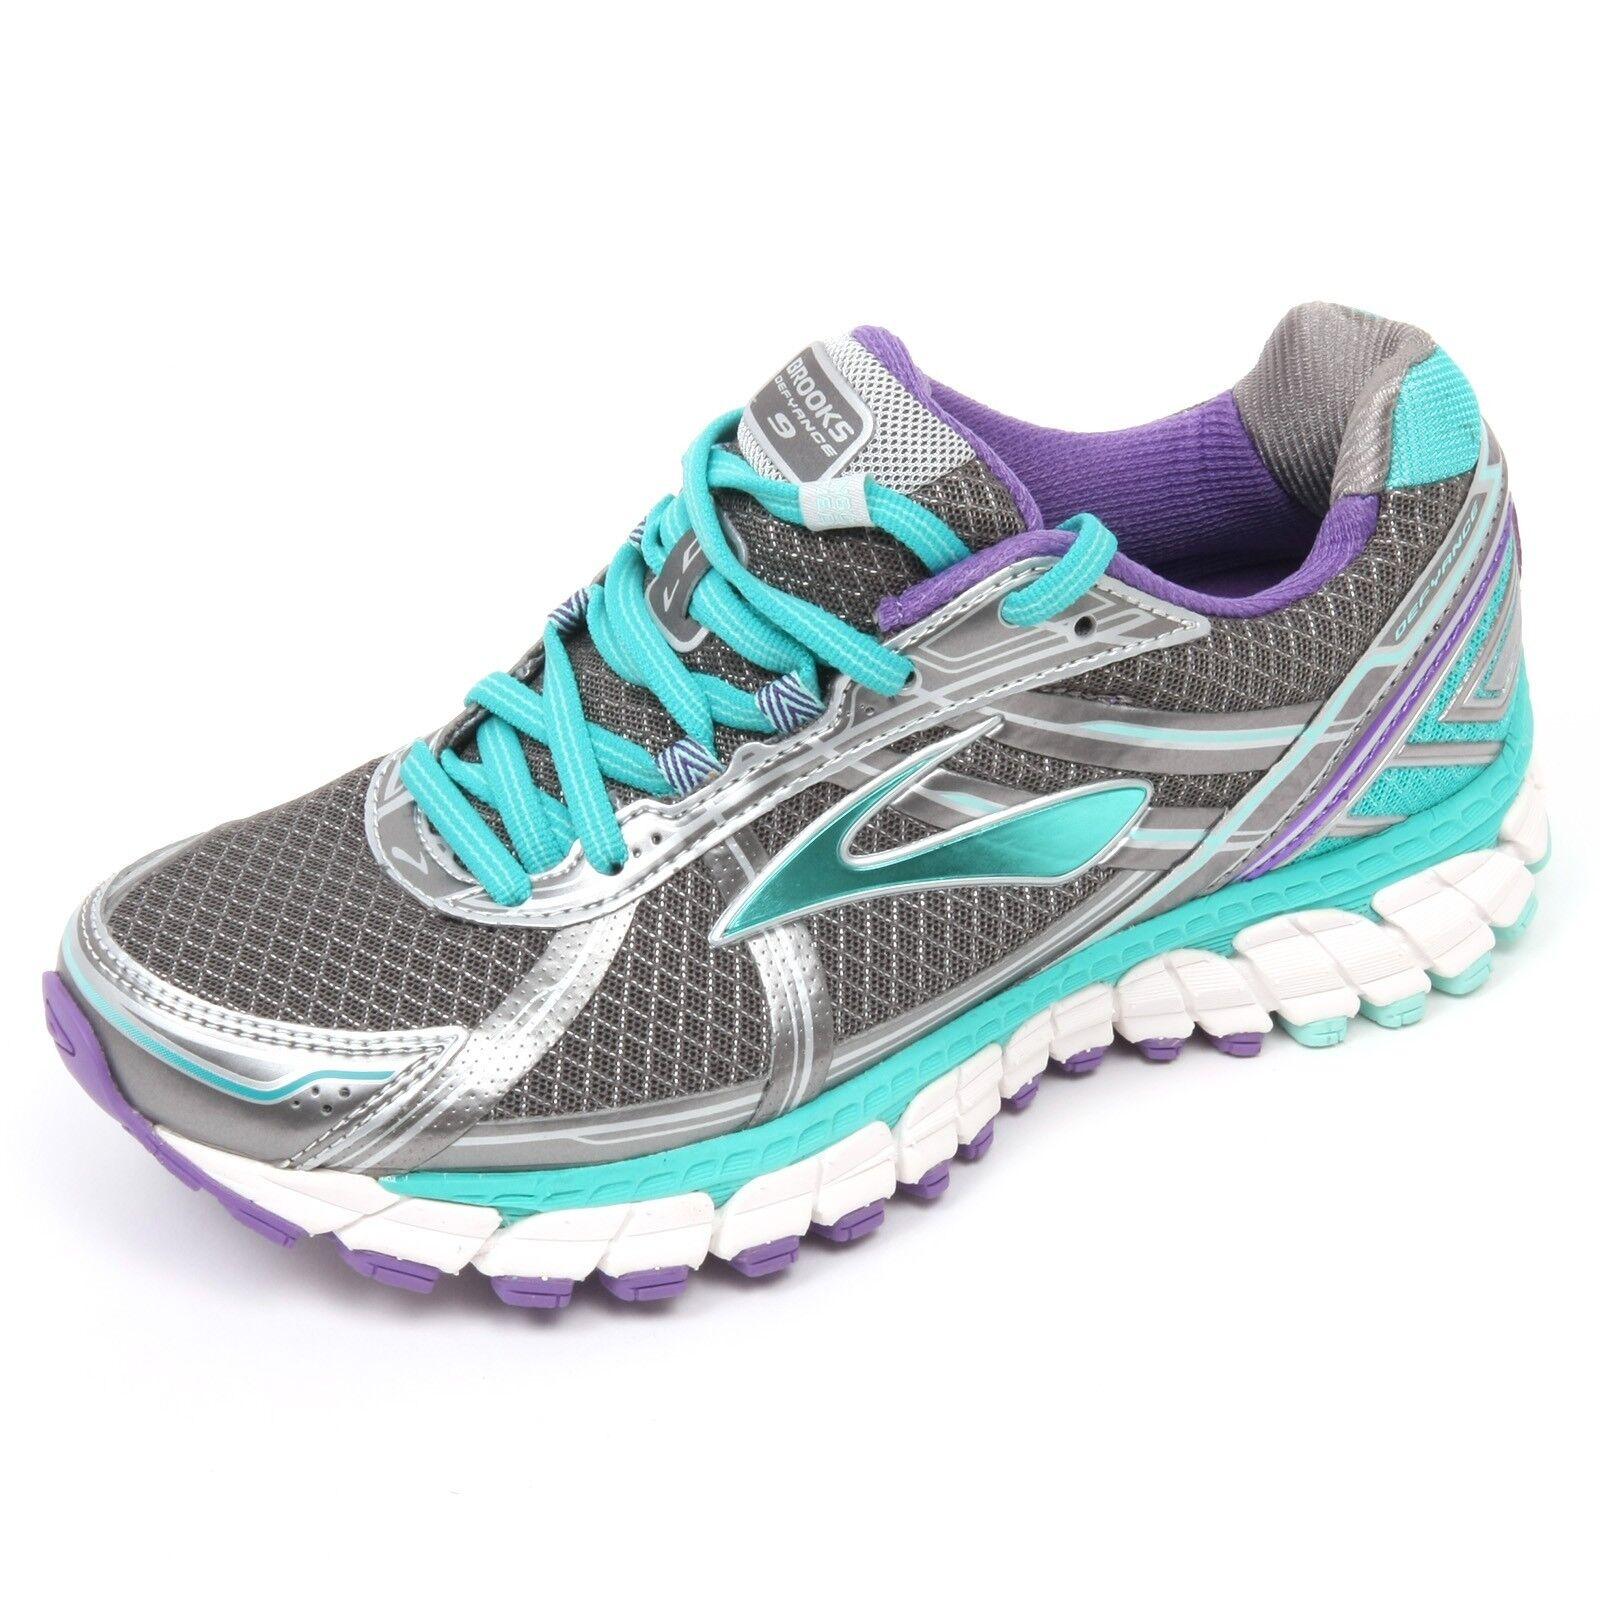 C5600 sneaker donna donna donna BROOKS DEFYANCE 9 scarpa grigio shoe woman 3505f7